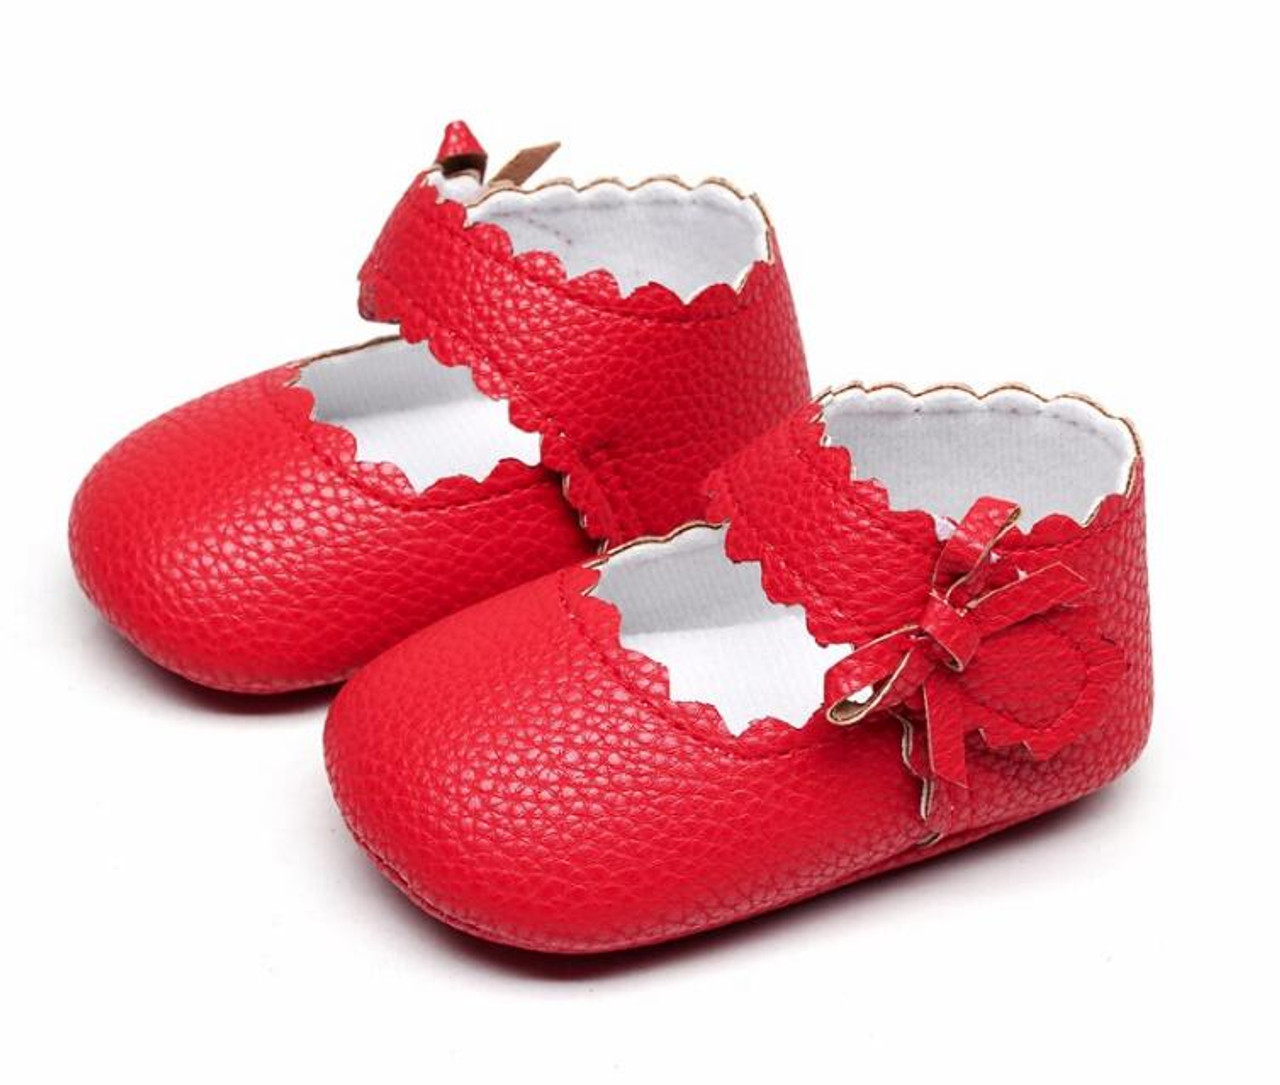 HONGTEYA New style Baby Girls soft Red